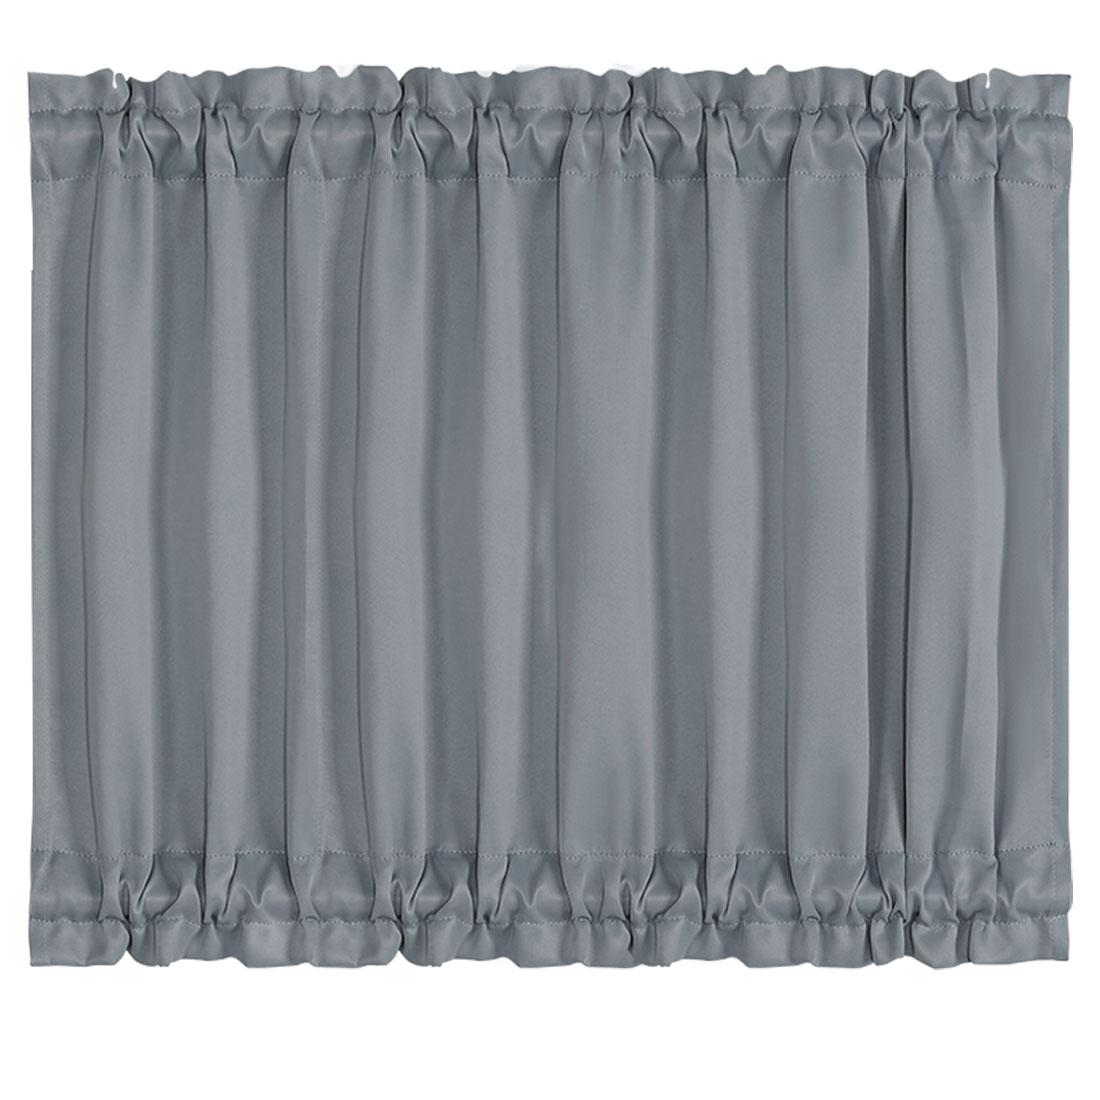 Elegant 54 x 40 Inch Blackout Curtains Rod Sliding Door Drapes Dark Gray